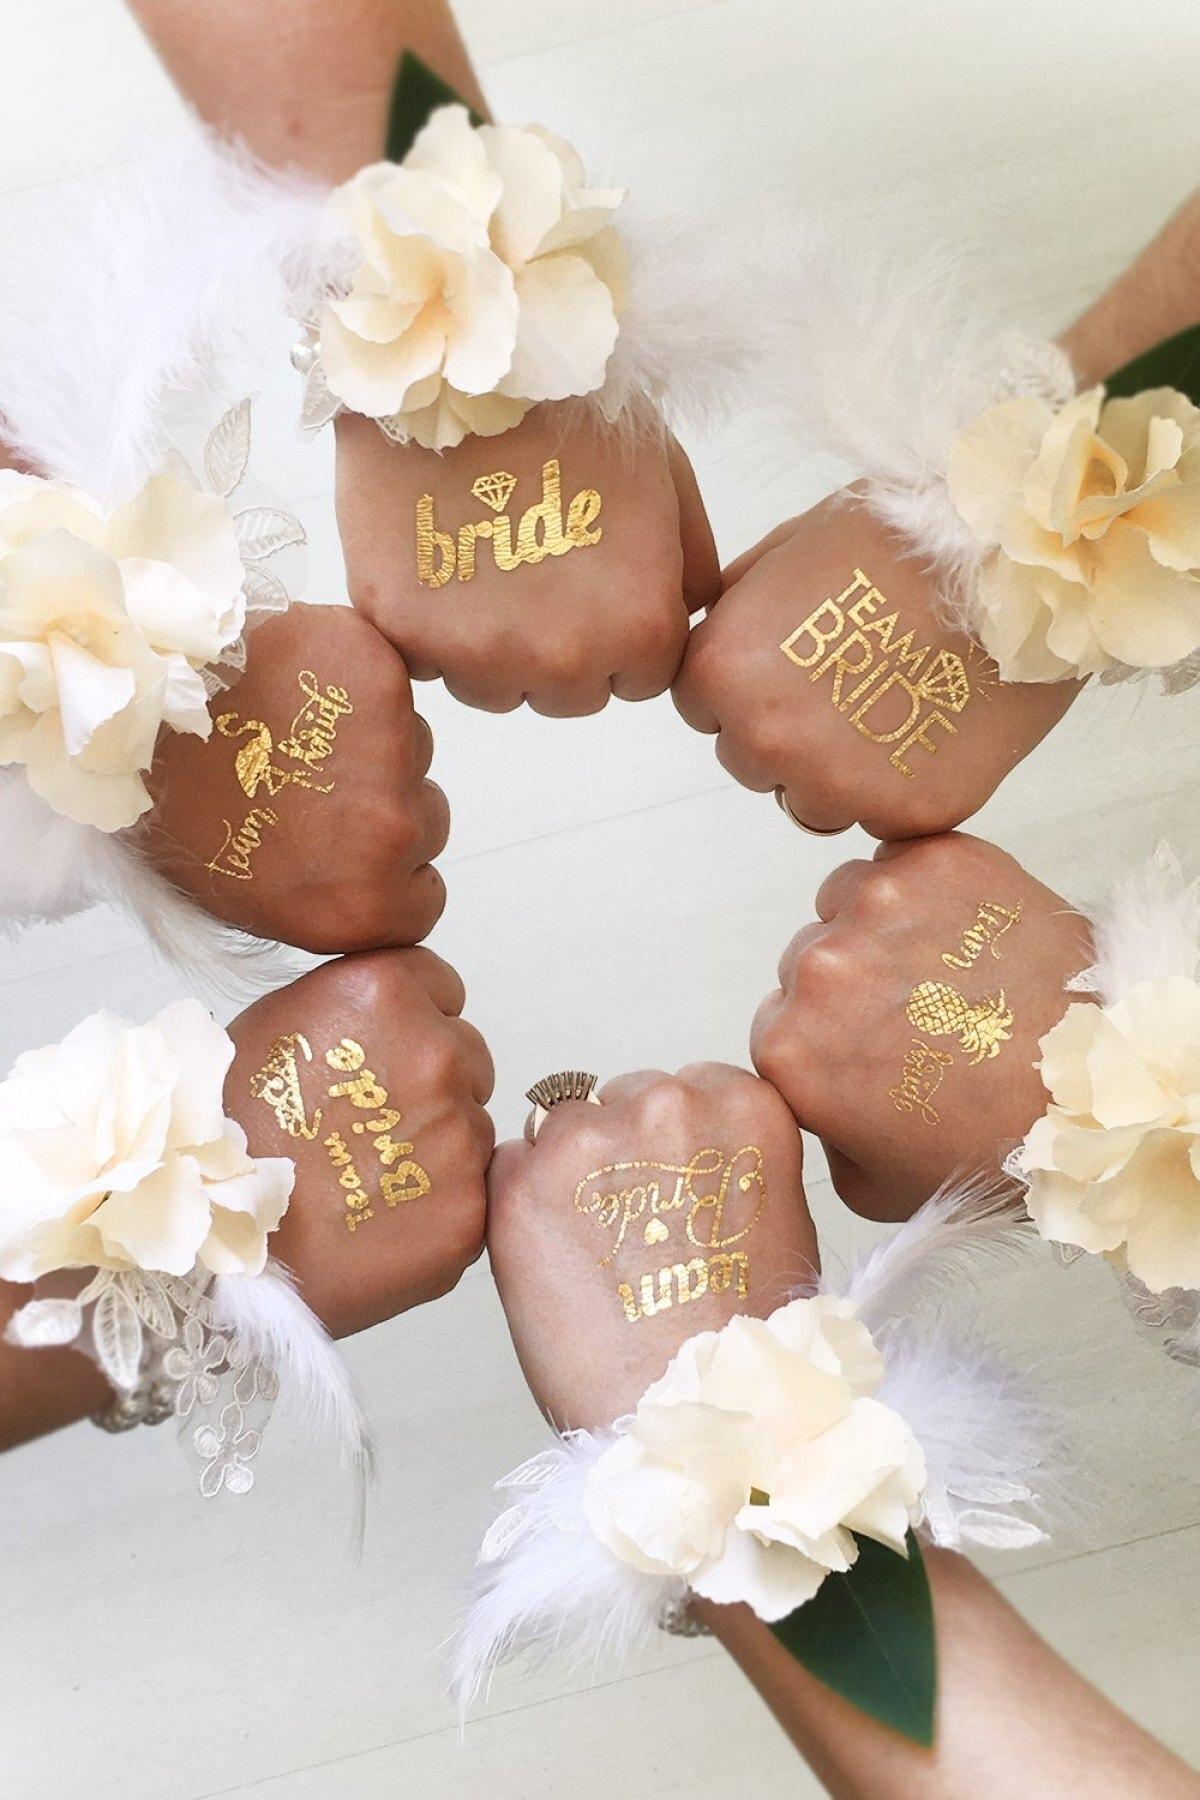 Bride To Be 1 Bride 10 Team Bride Gold Renkli Altın Sarısı Geçici Dövme Bekarlığa Veda Partisi